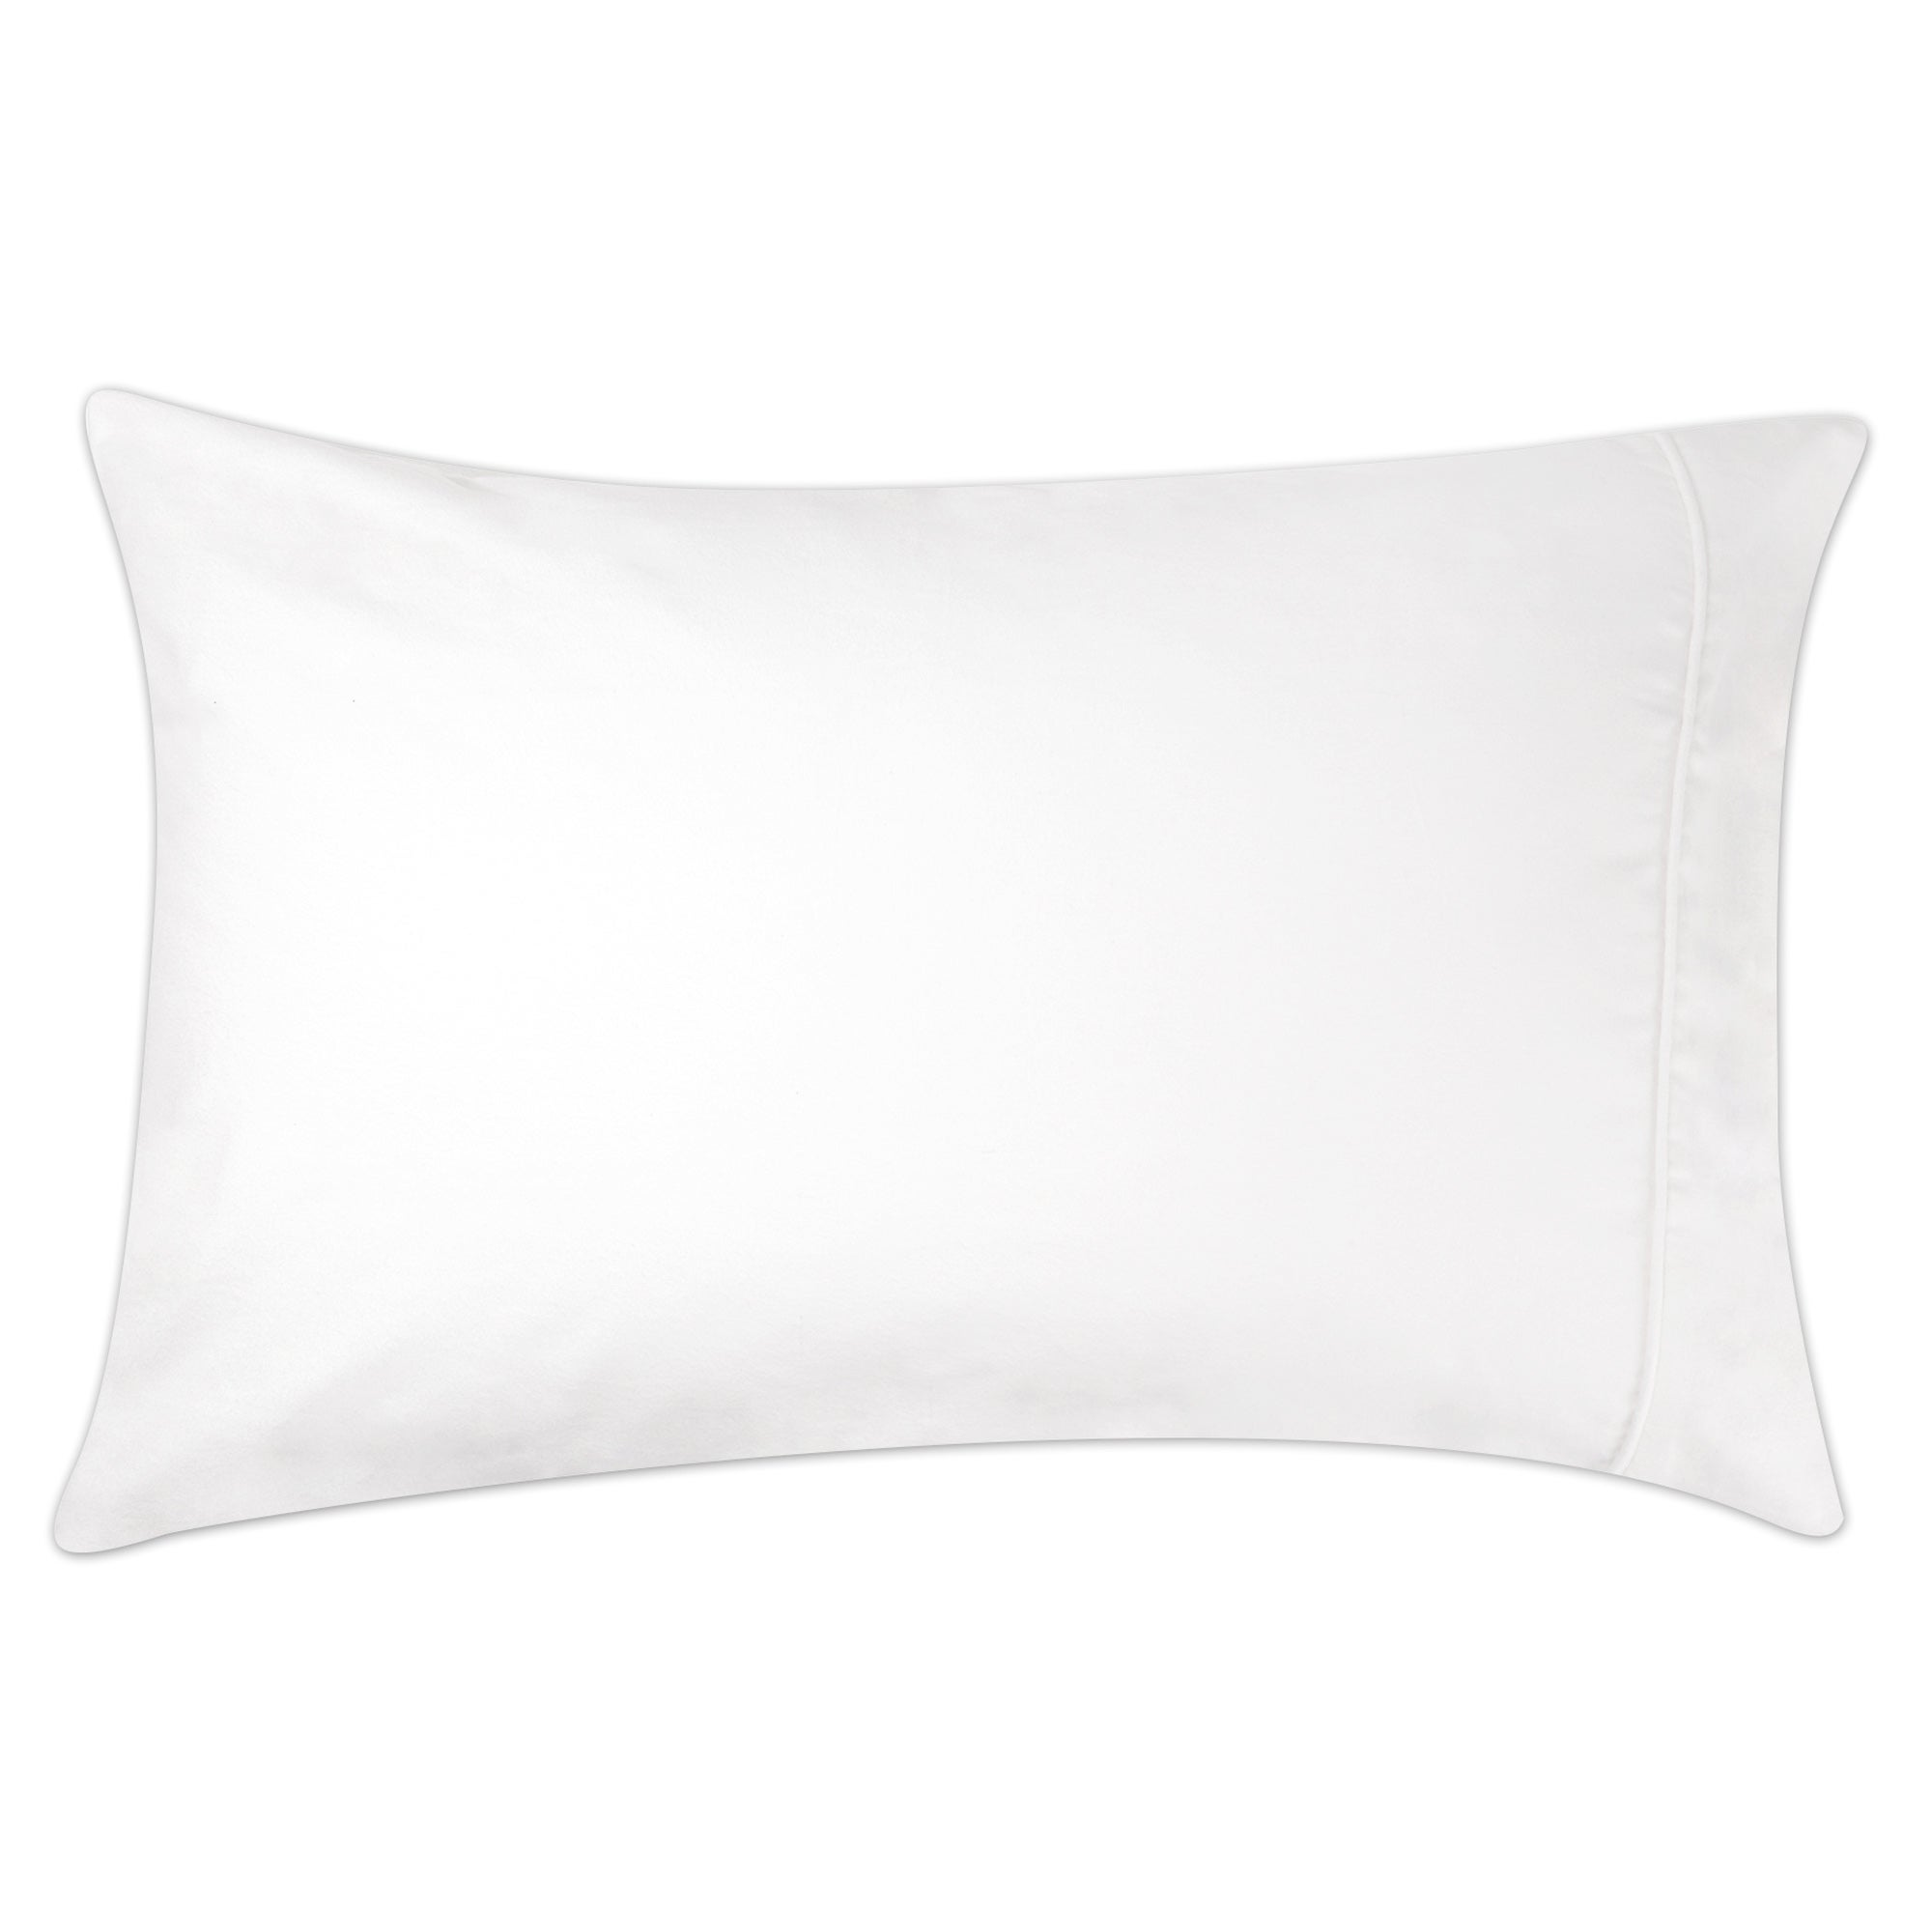 Dorma White Velvety Soft Housewife Pillowcase